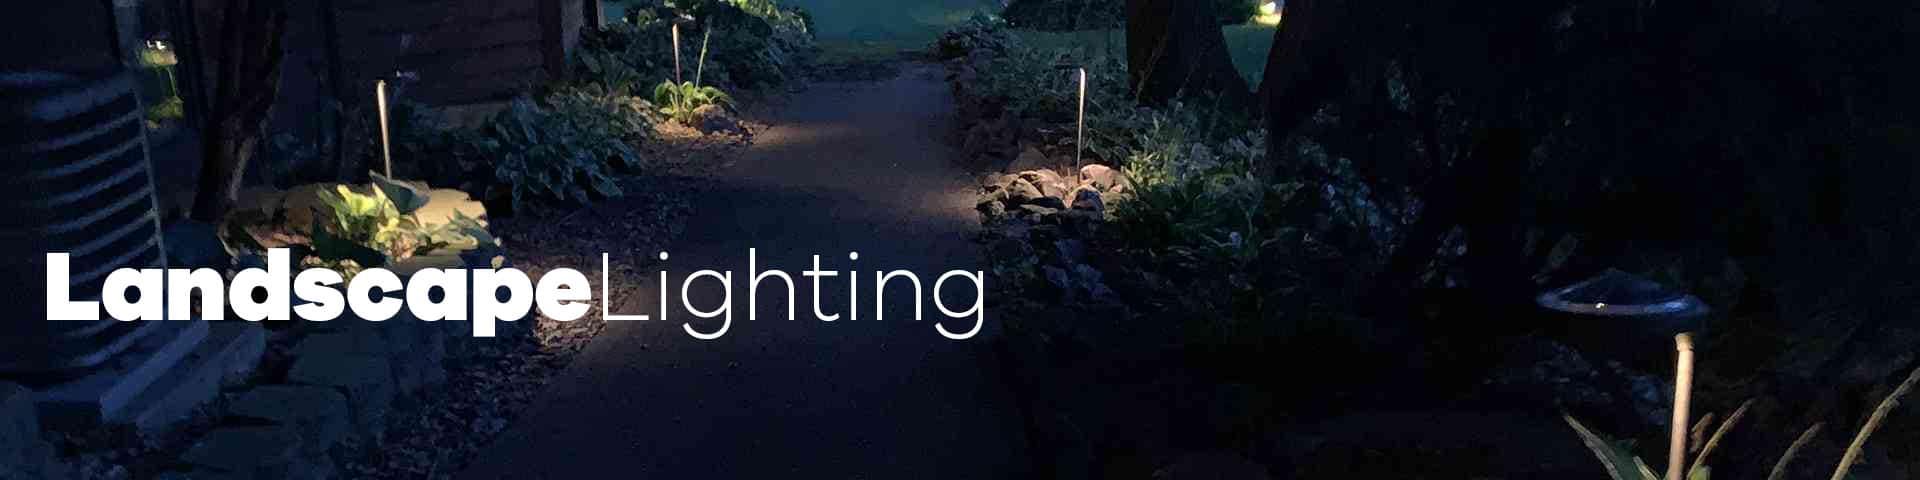 landscape lighting from Touchstone Lights